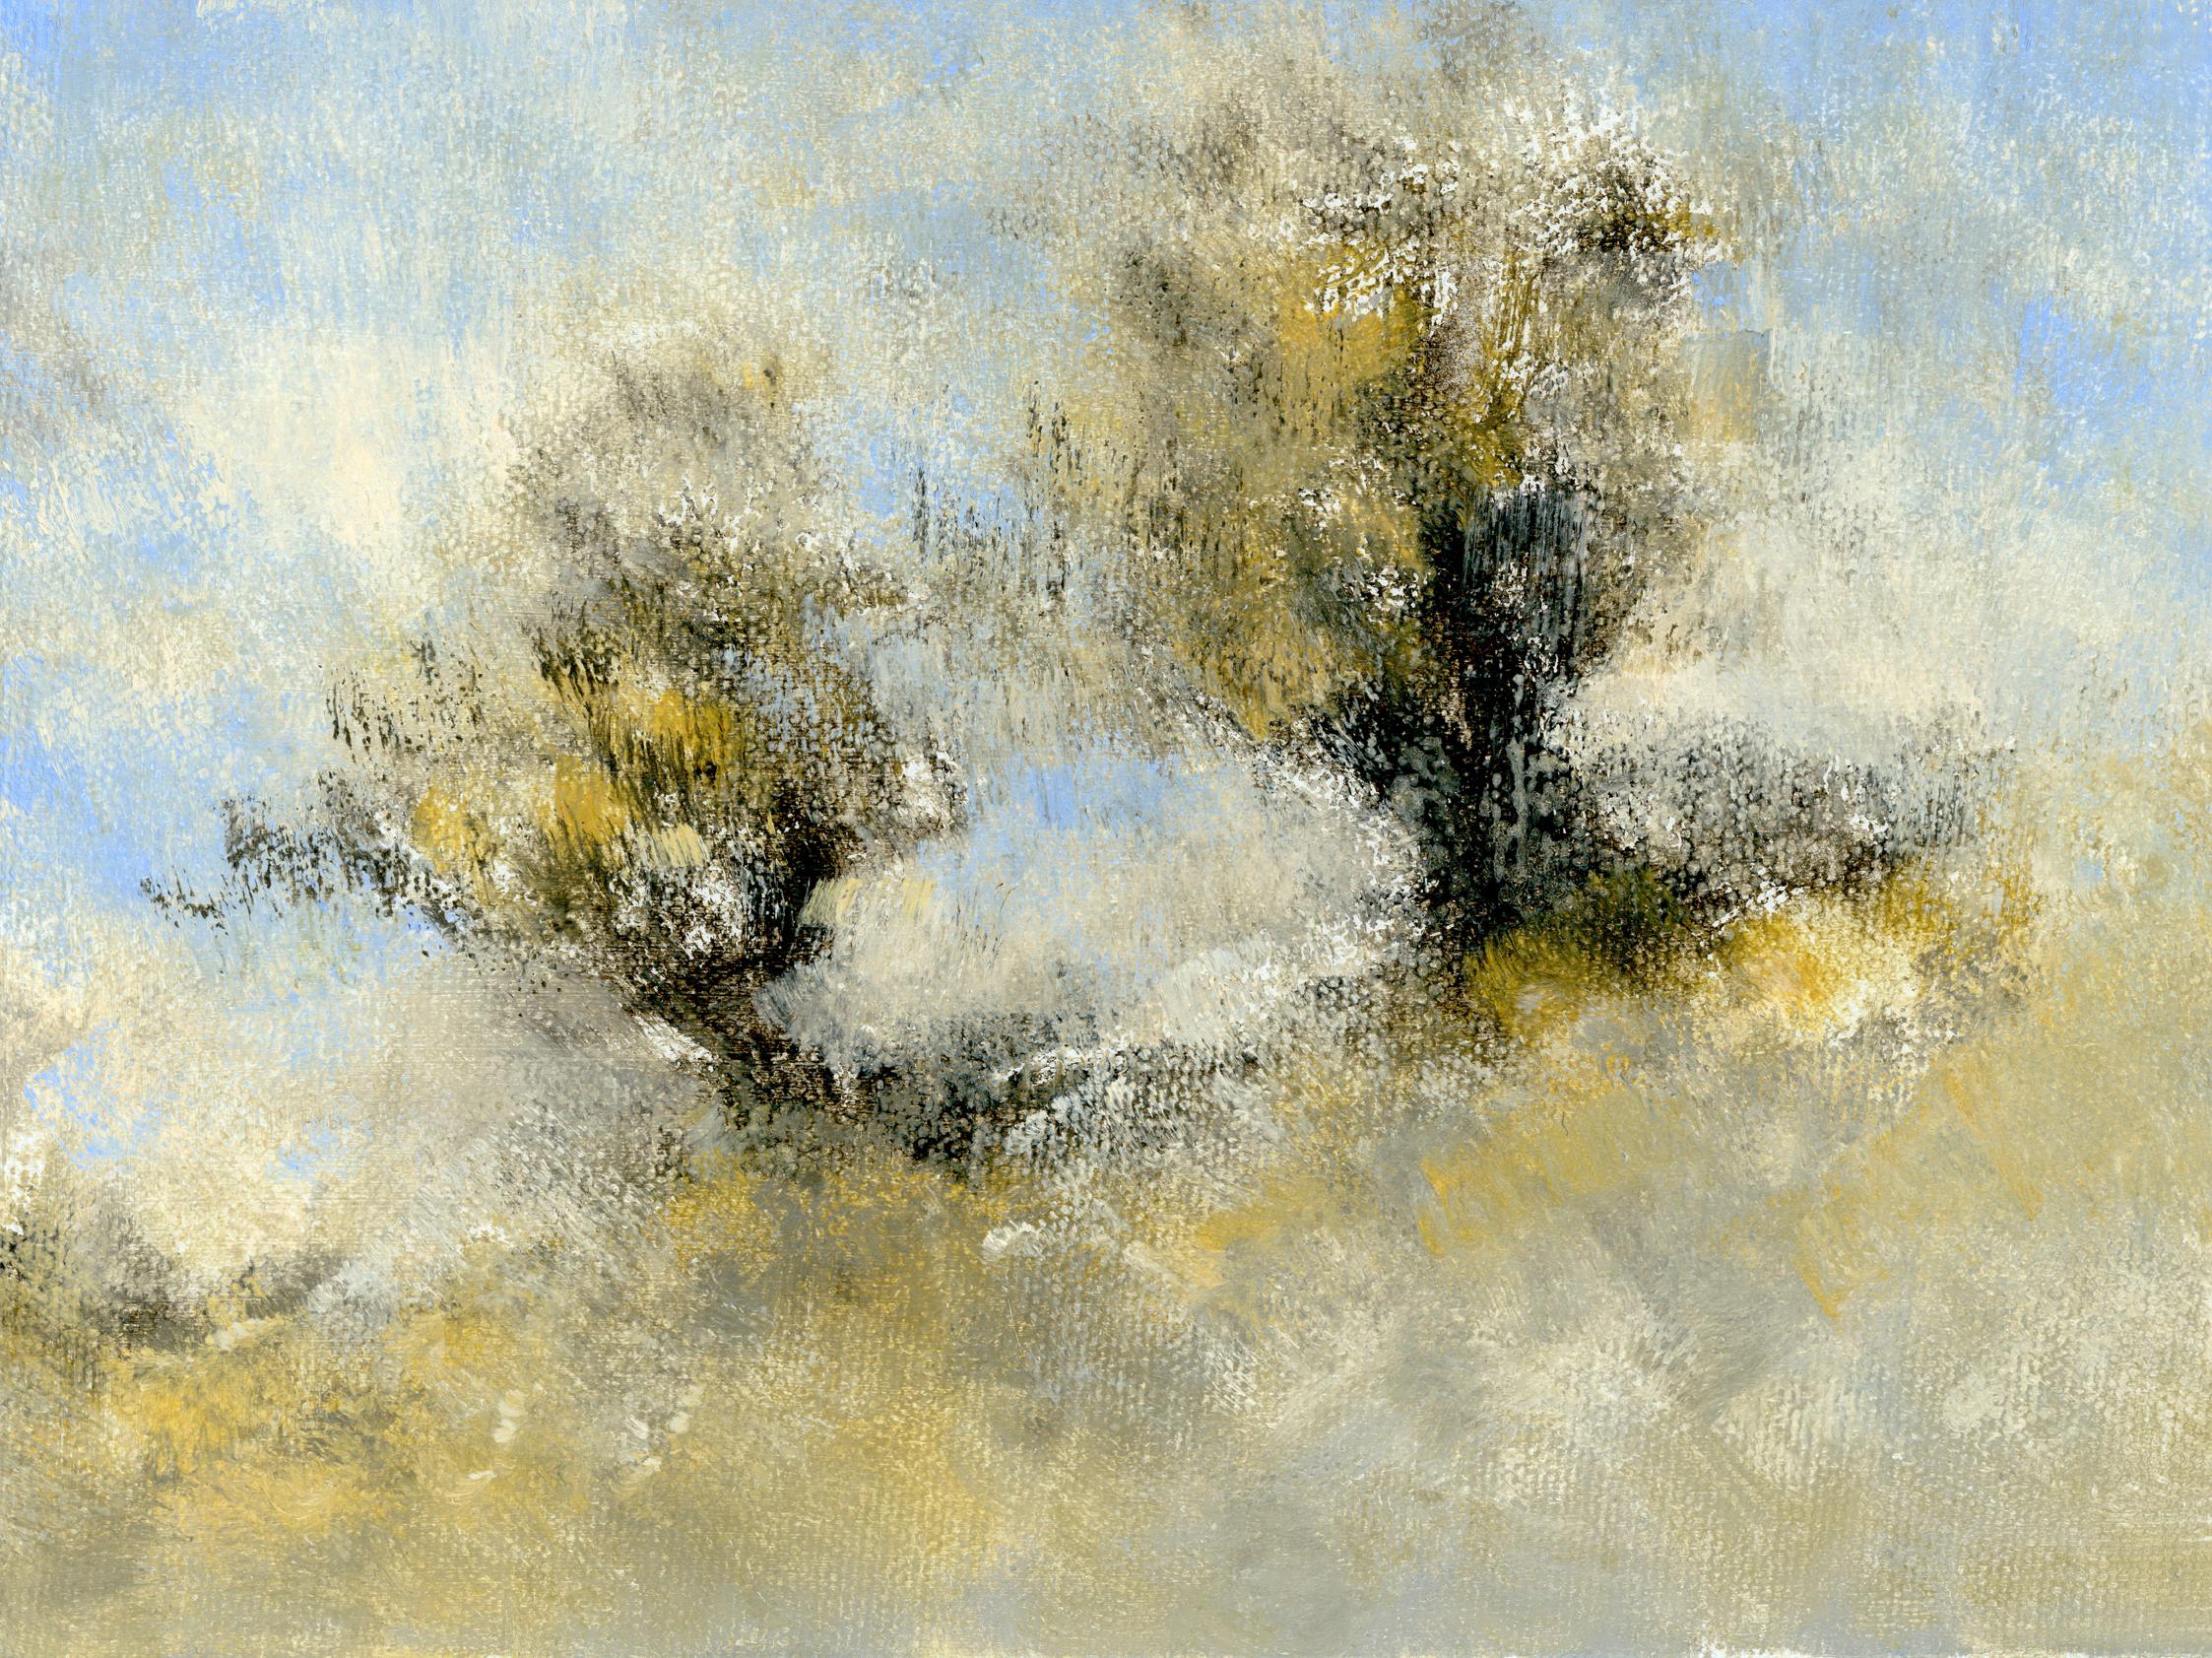 Glenn-Suokko-Landscape-914-2.jpg